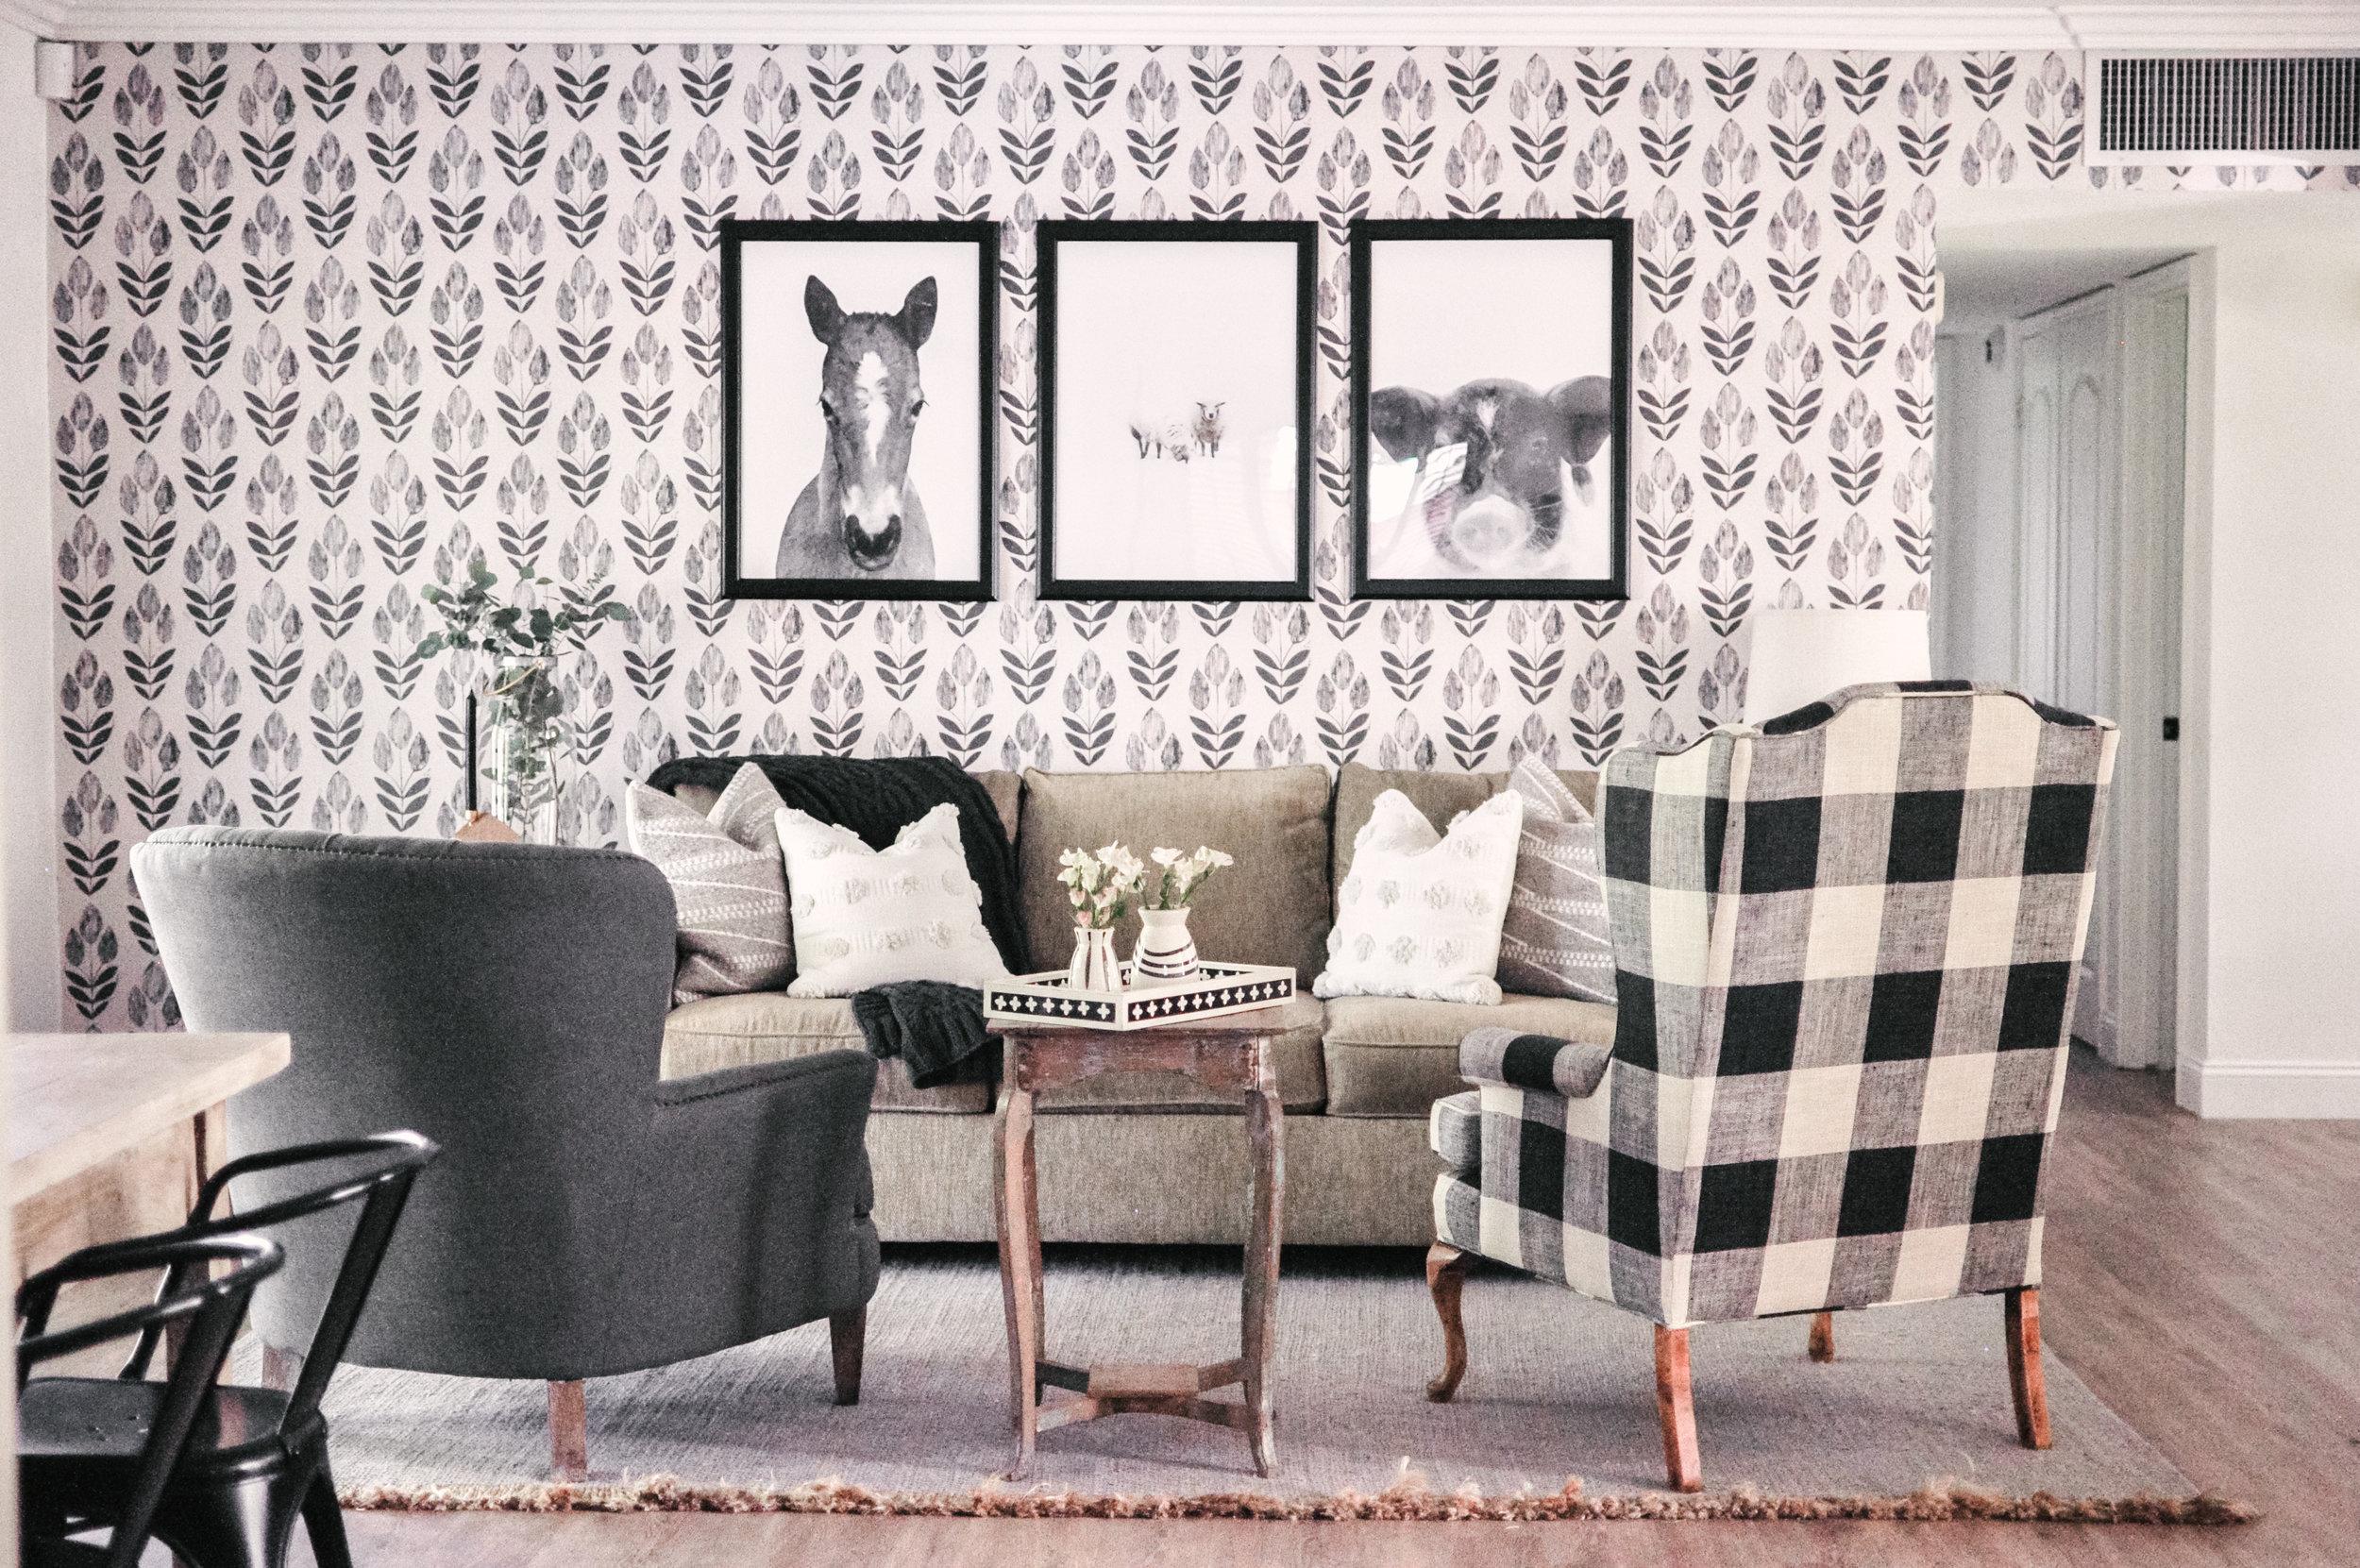 Ladwig-Scandinavian-Block-Tulip-Print-Wallpaper.jpg